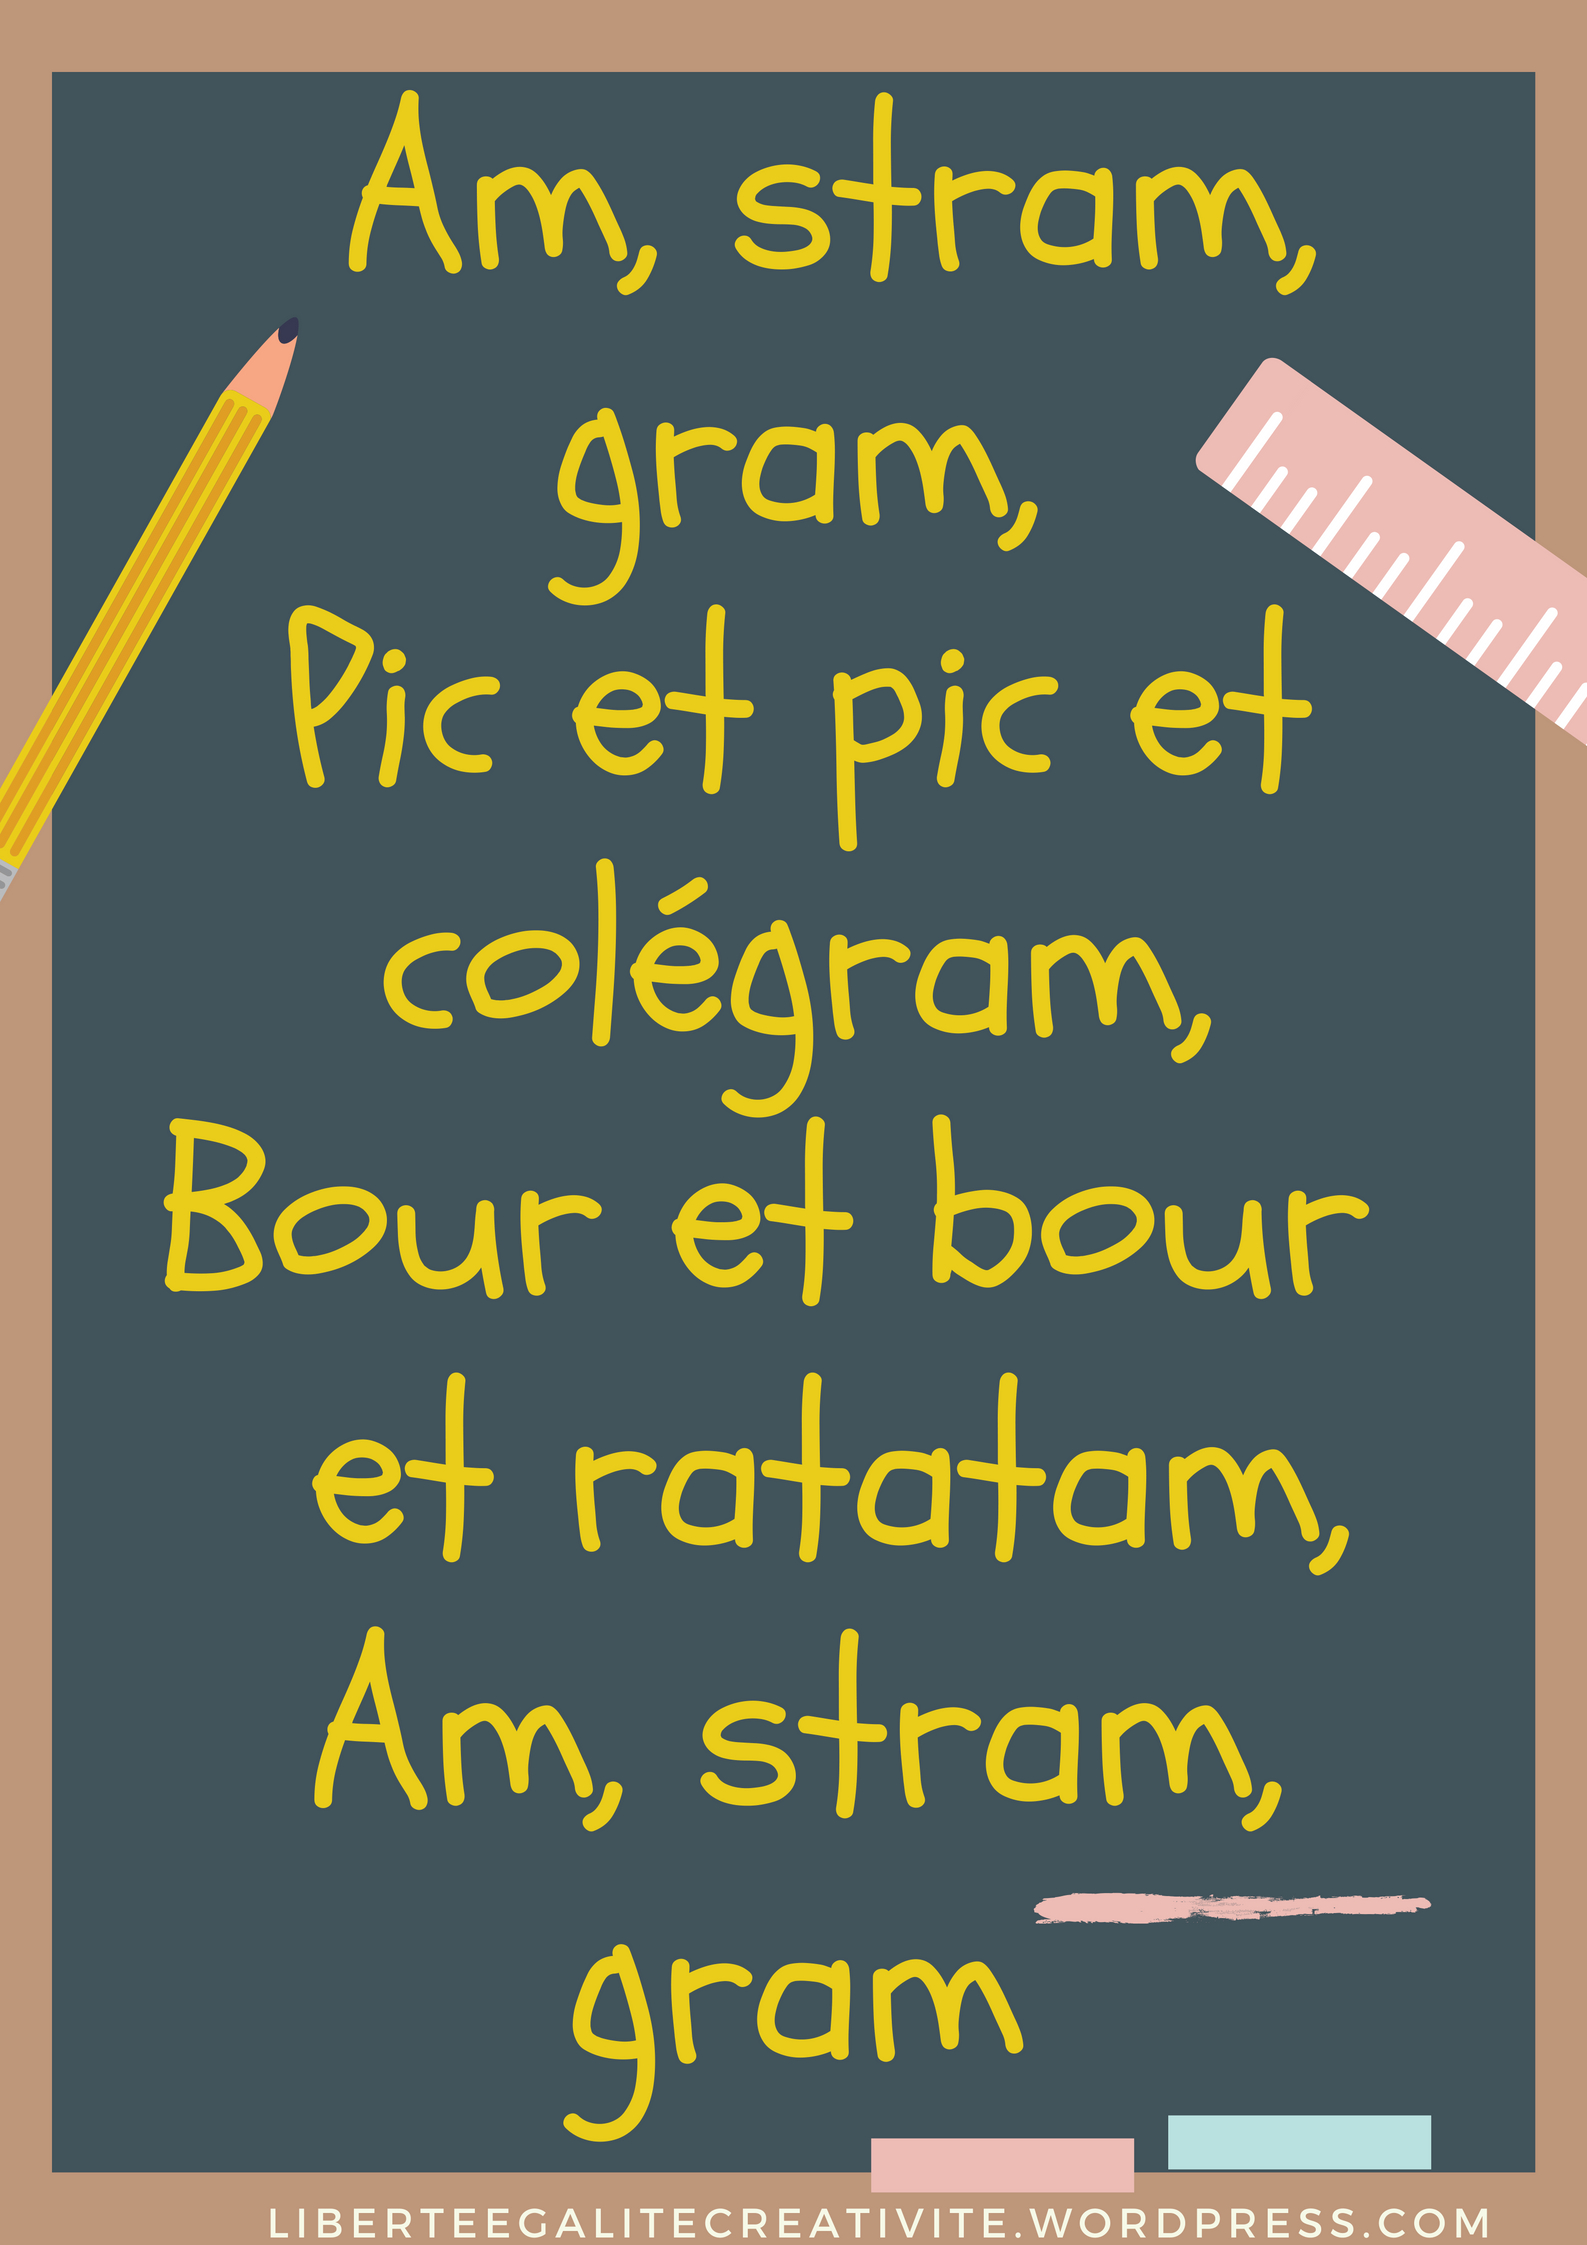 Am, stram, gram, Pic et pic et colégram, Bour et bour et ratatam, Am, stram, gram